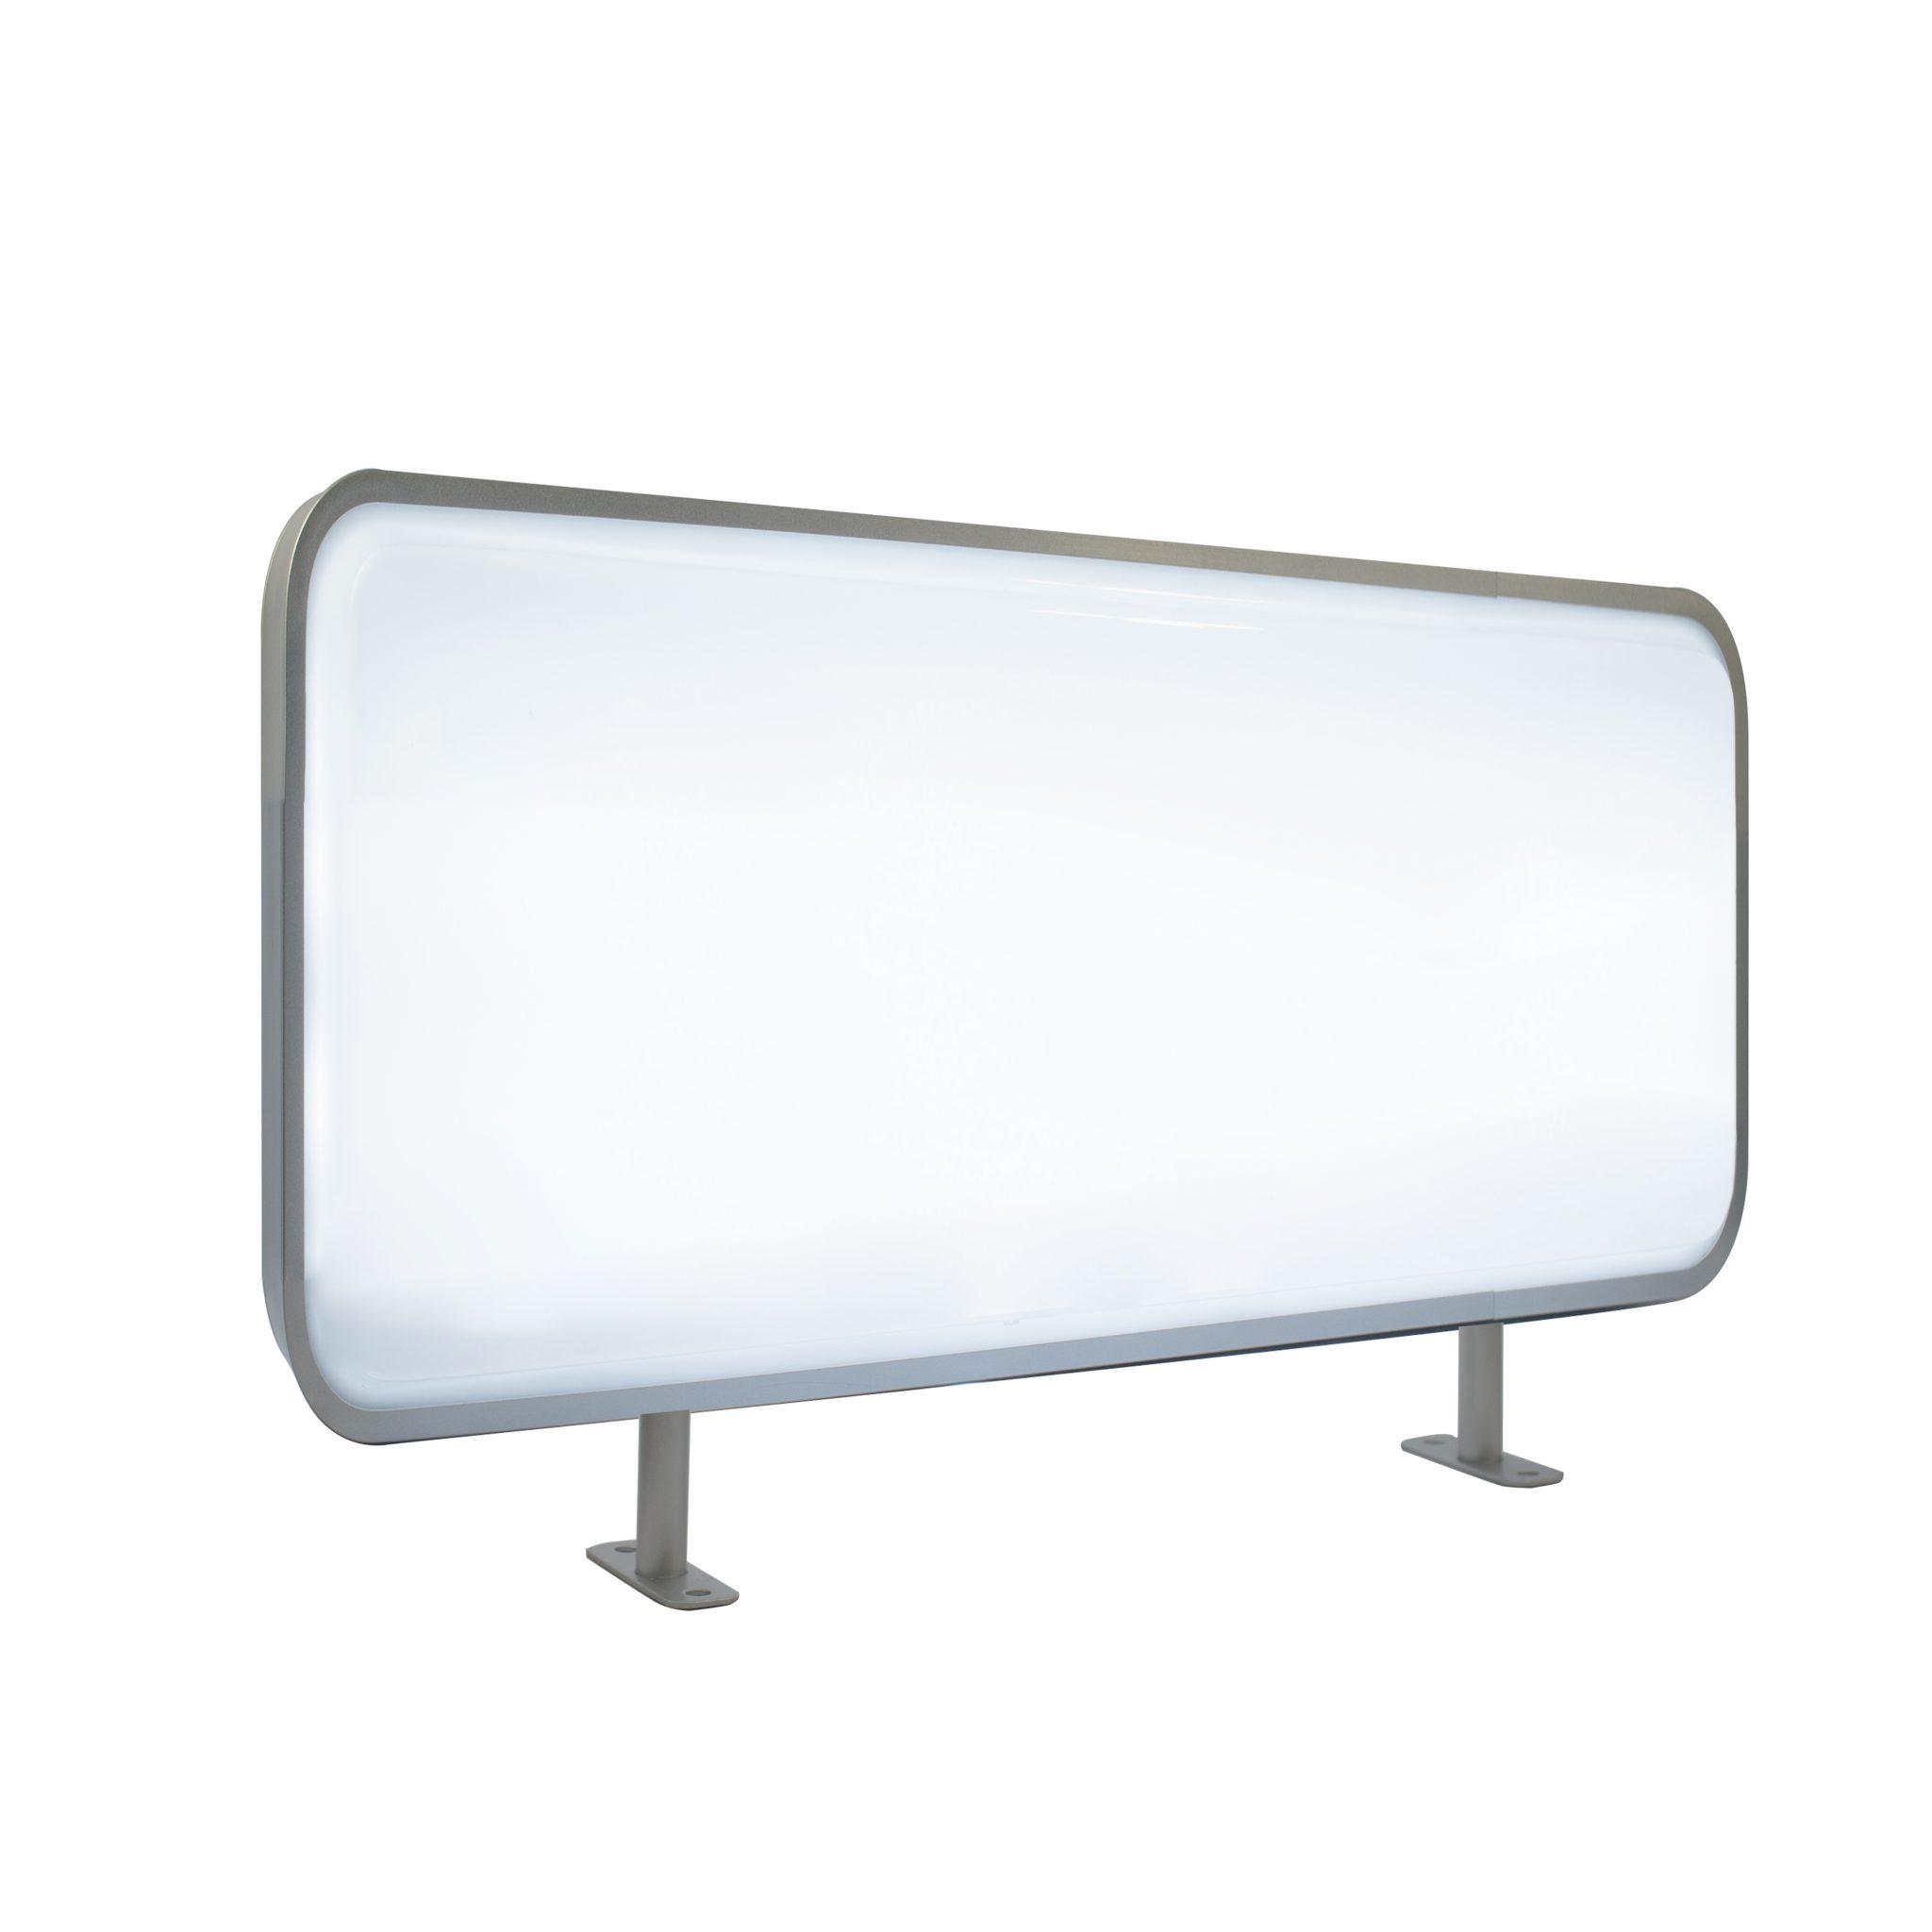 45x100cm Rectangular Vertical Projecting Light Box Led